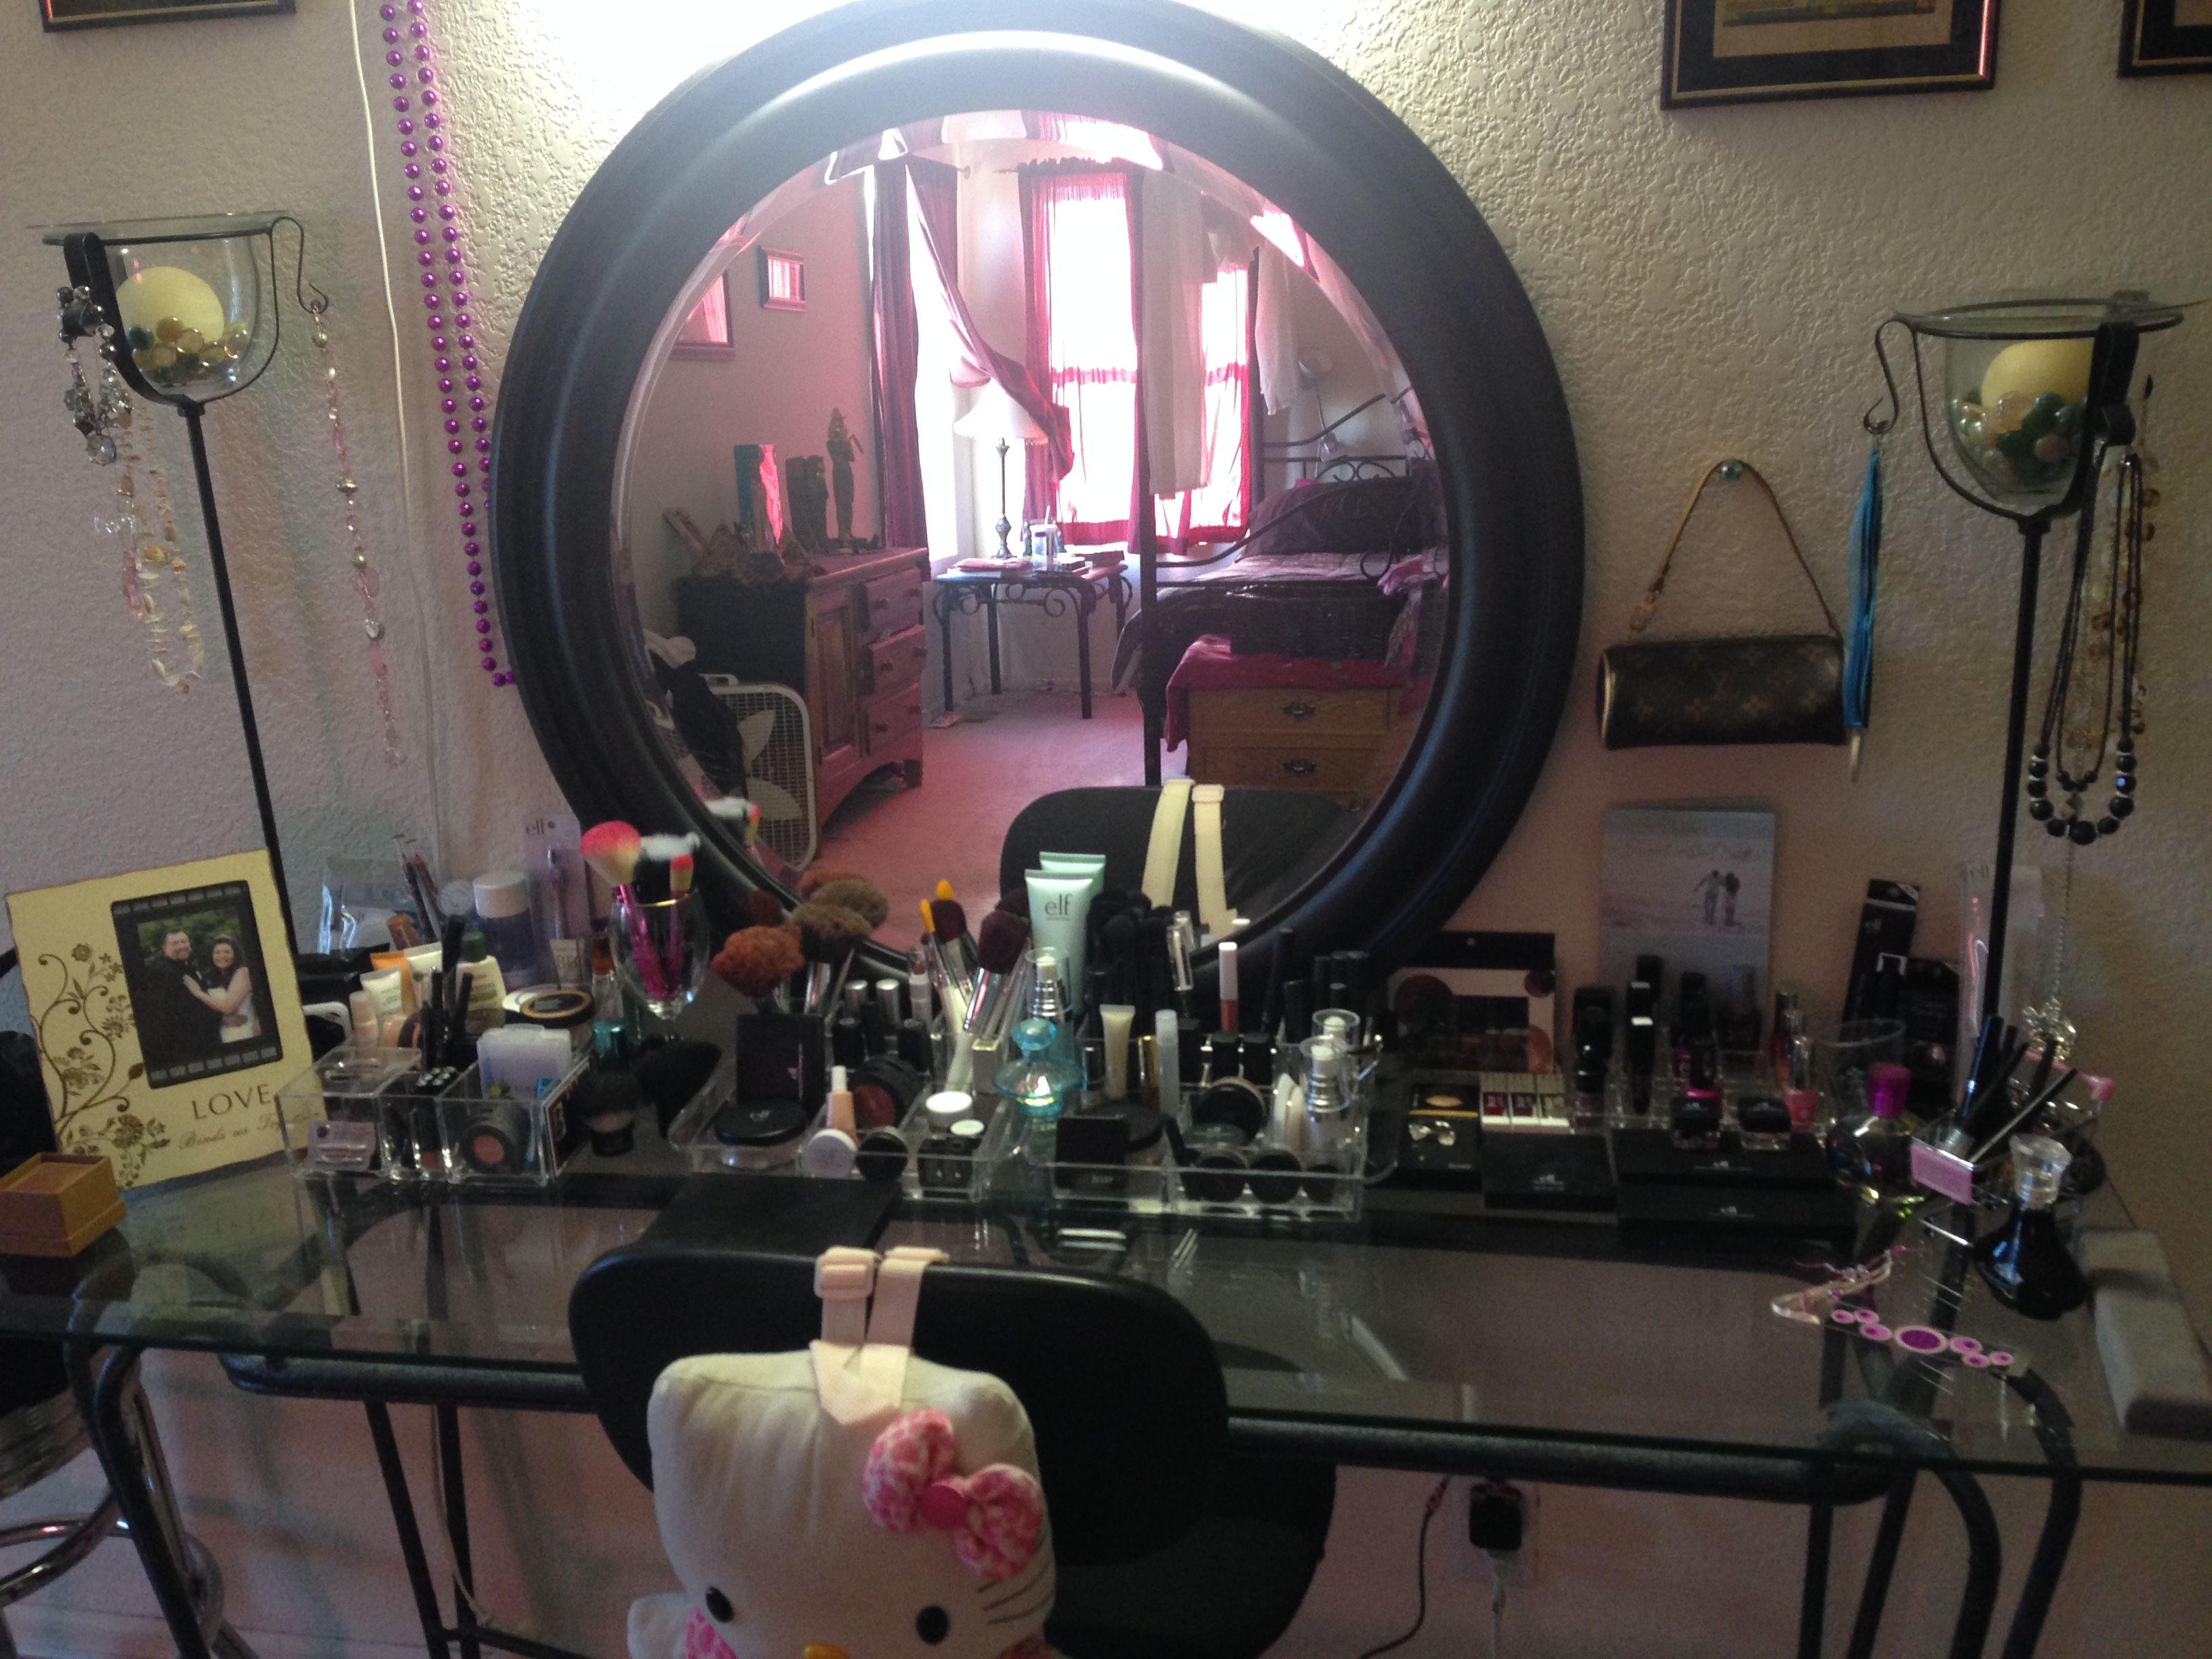 Pin By Nikilynn Madera On Girlie Girl Love Vanity Mirror